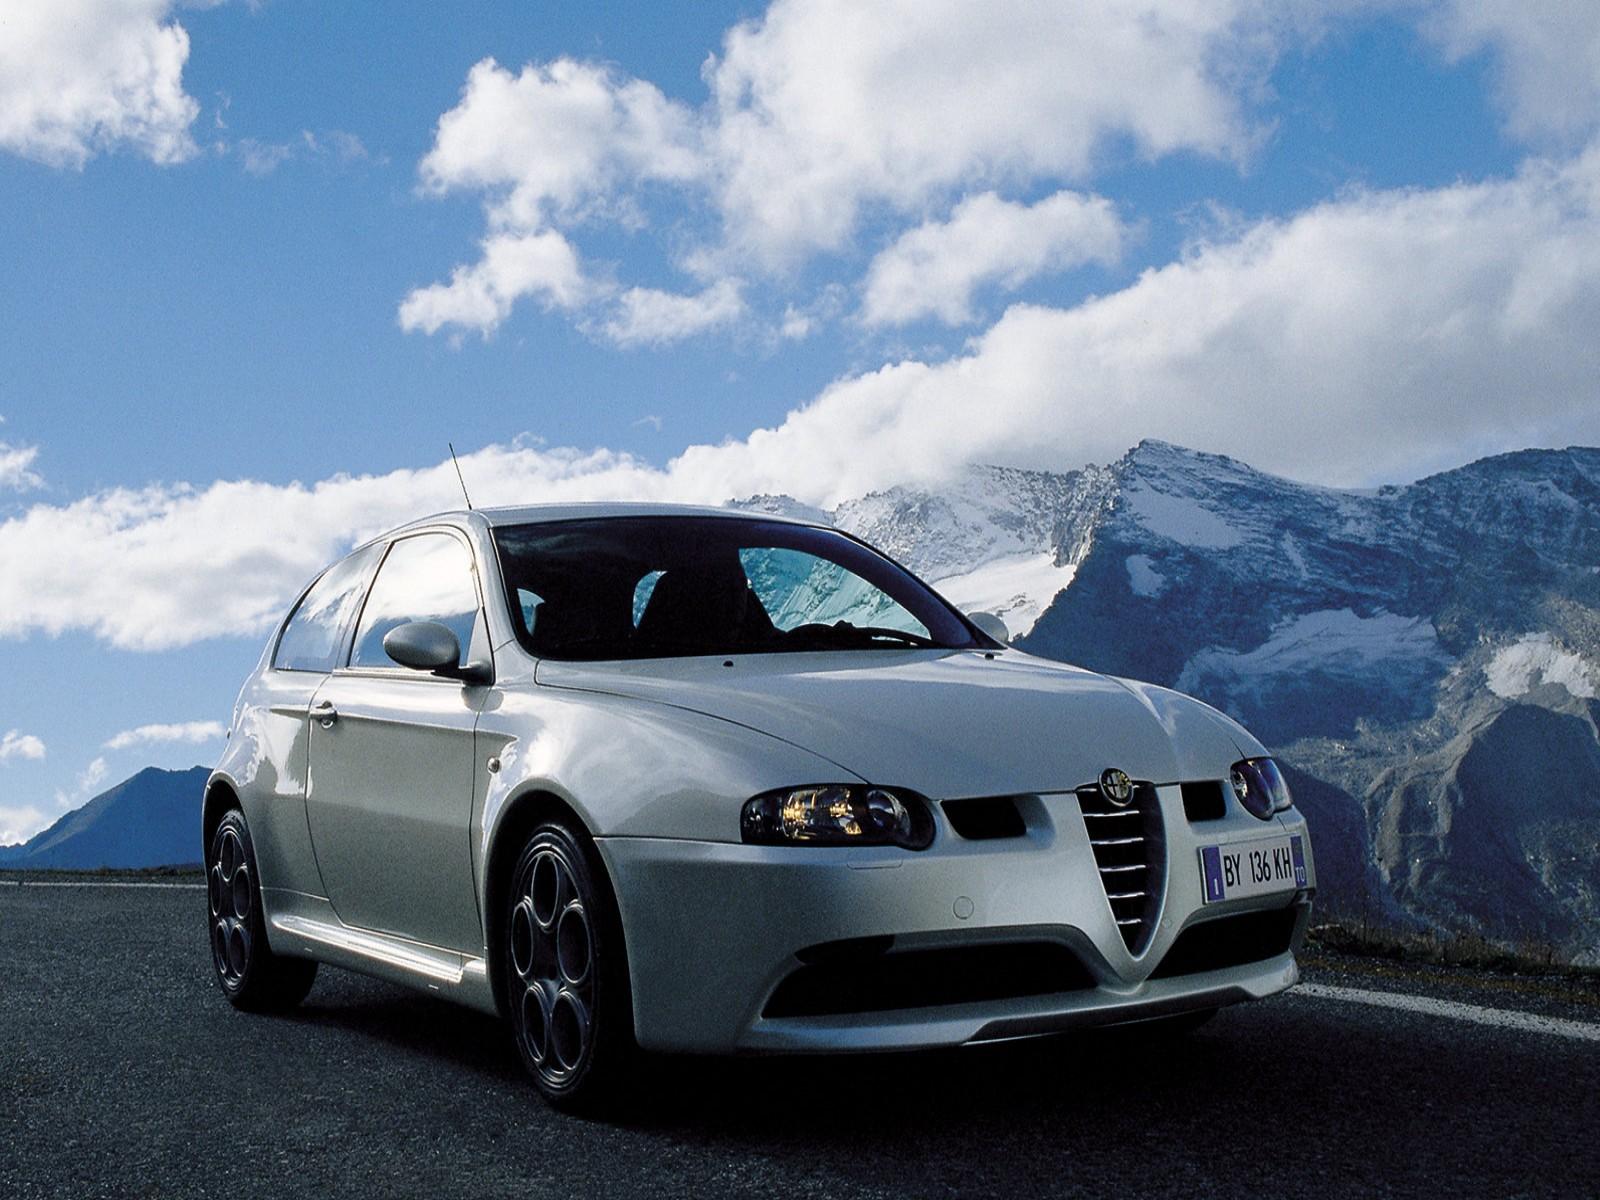 http://4.bp.blogspot.com/-tJmWDcxnKXw/TkFuHCVoSCI/AAAAAAAADzc/Qnp3CLH7Yfc/s1600/Alfa+Romeo+147+GTA+2002+02.jpg